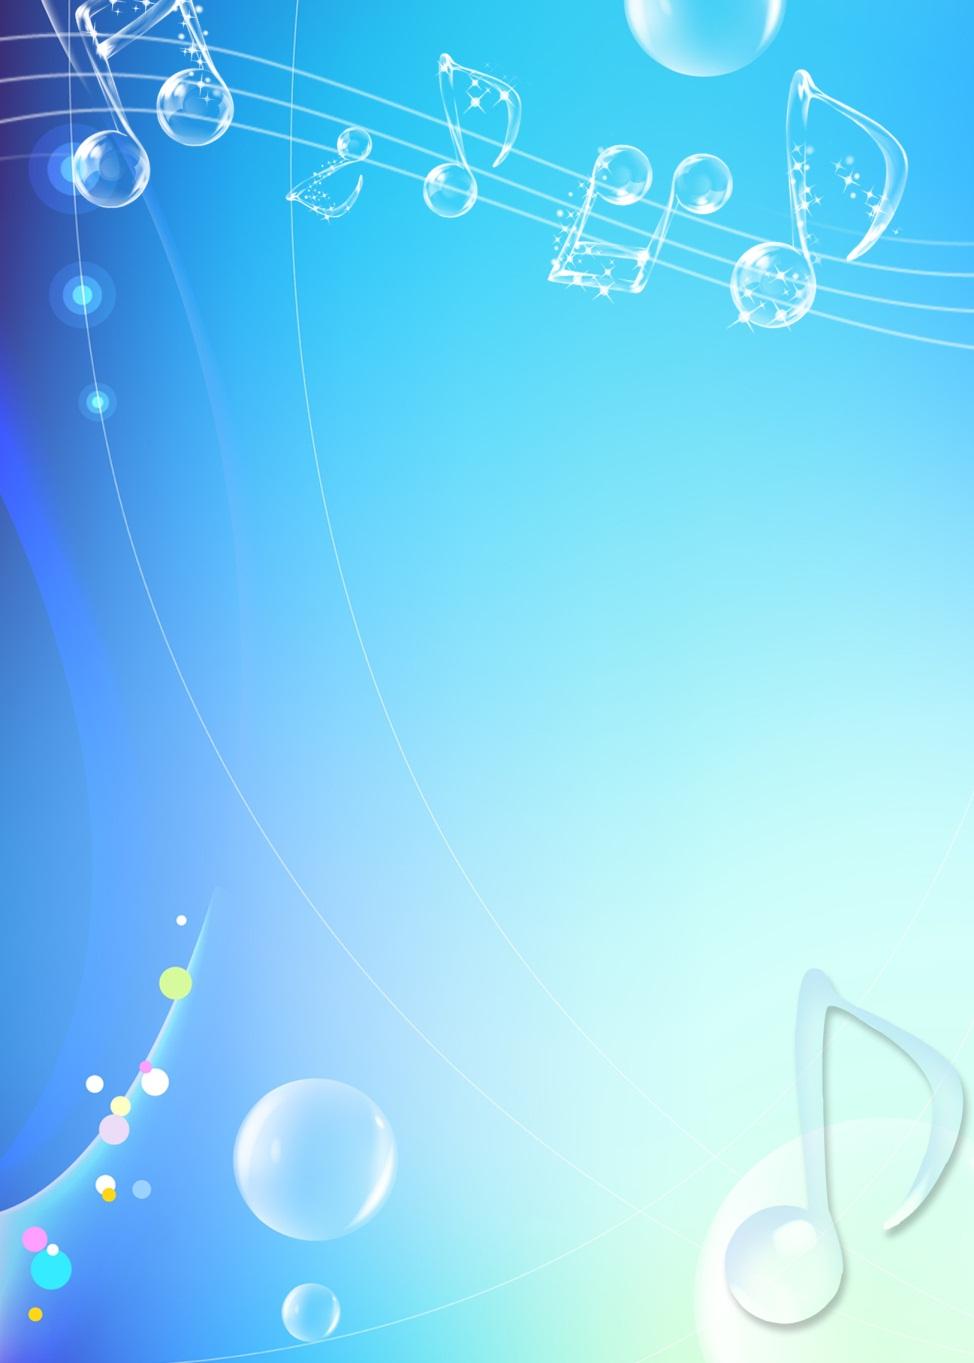 Рамка музыкальная картинки